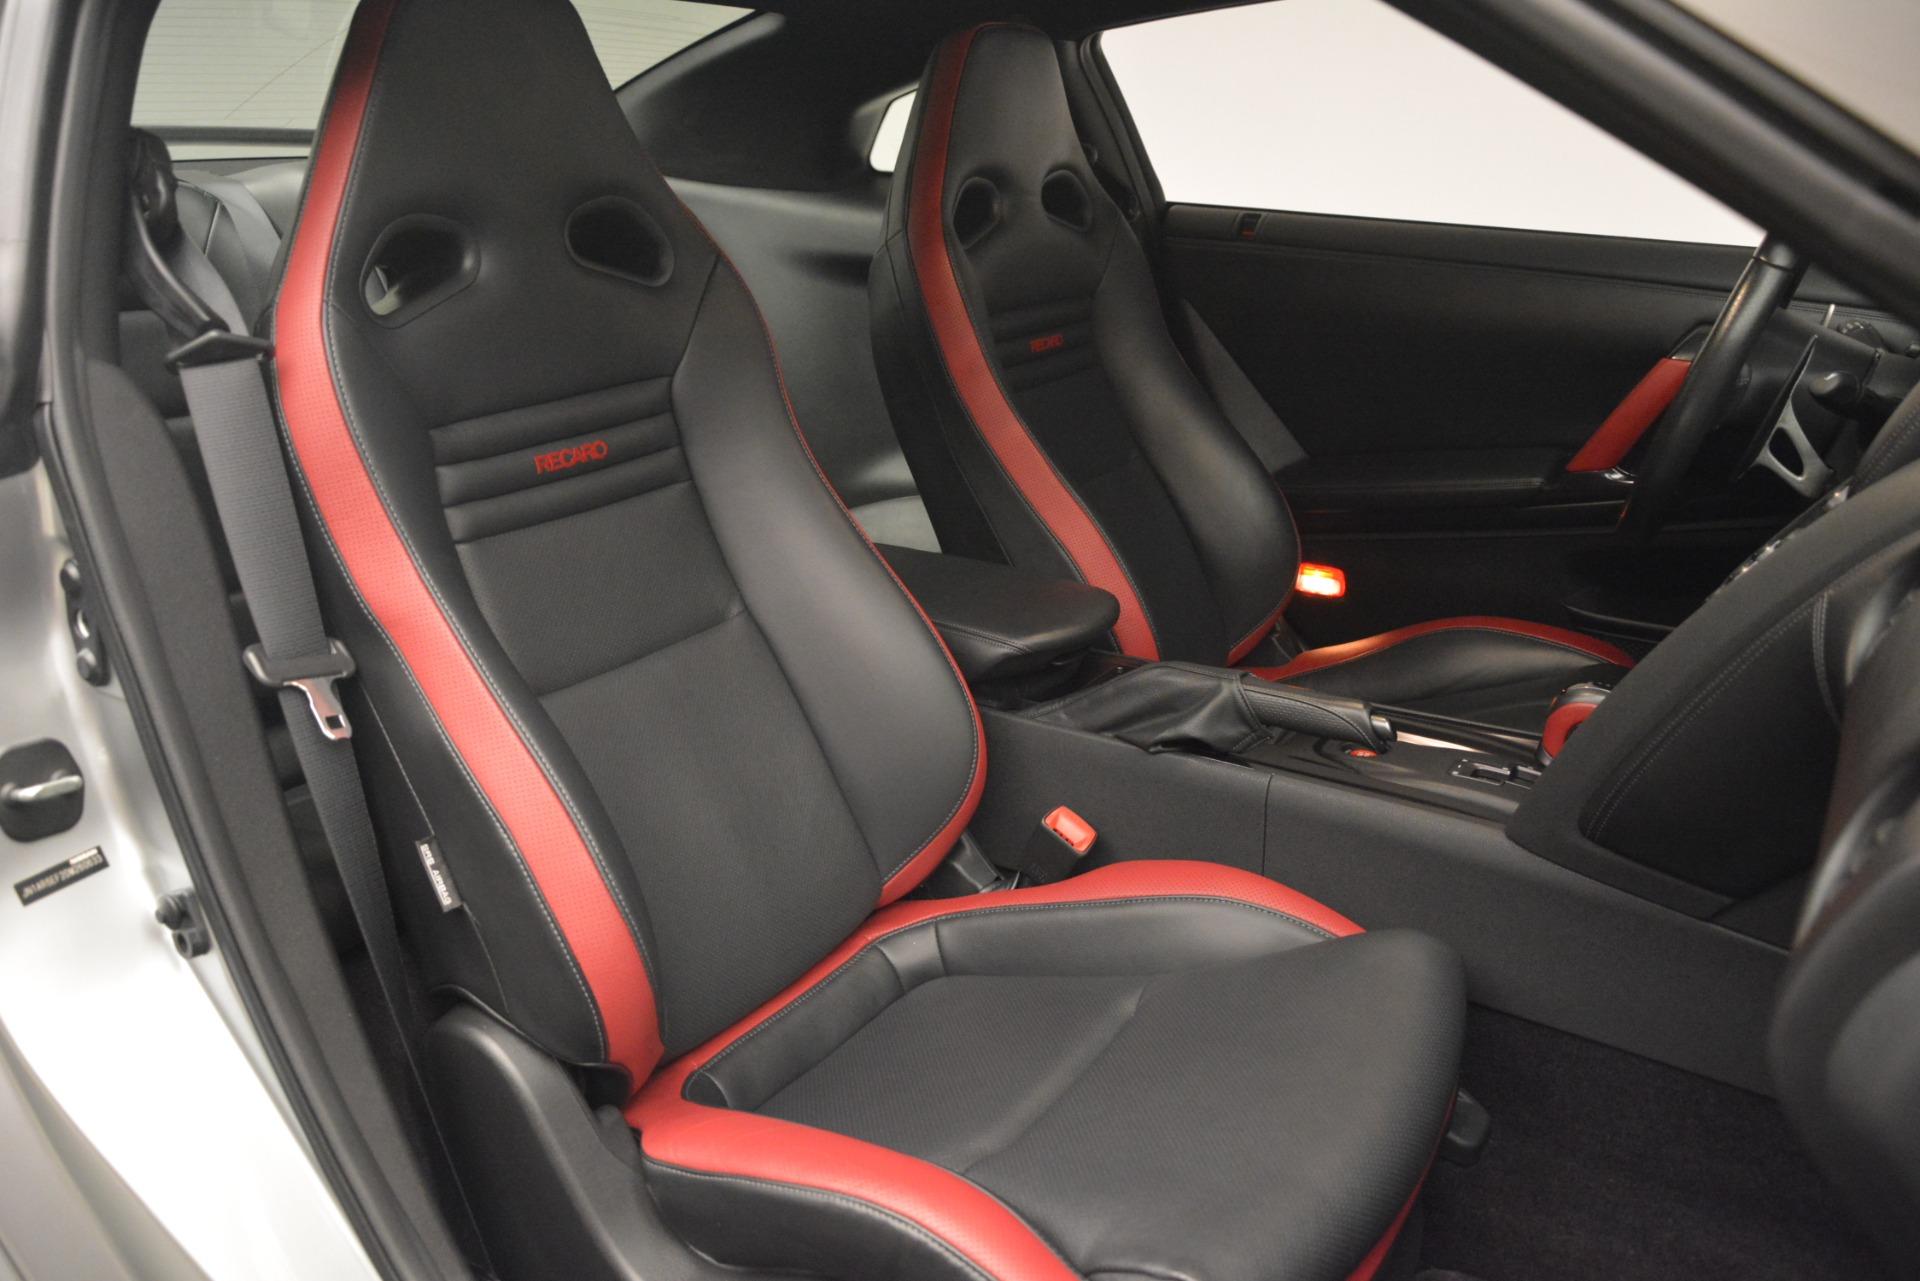 Used 2013 Nissan GT-R Black Edition | Greenwich, CT